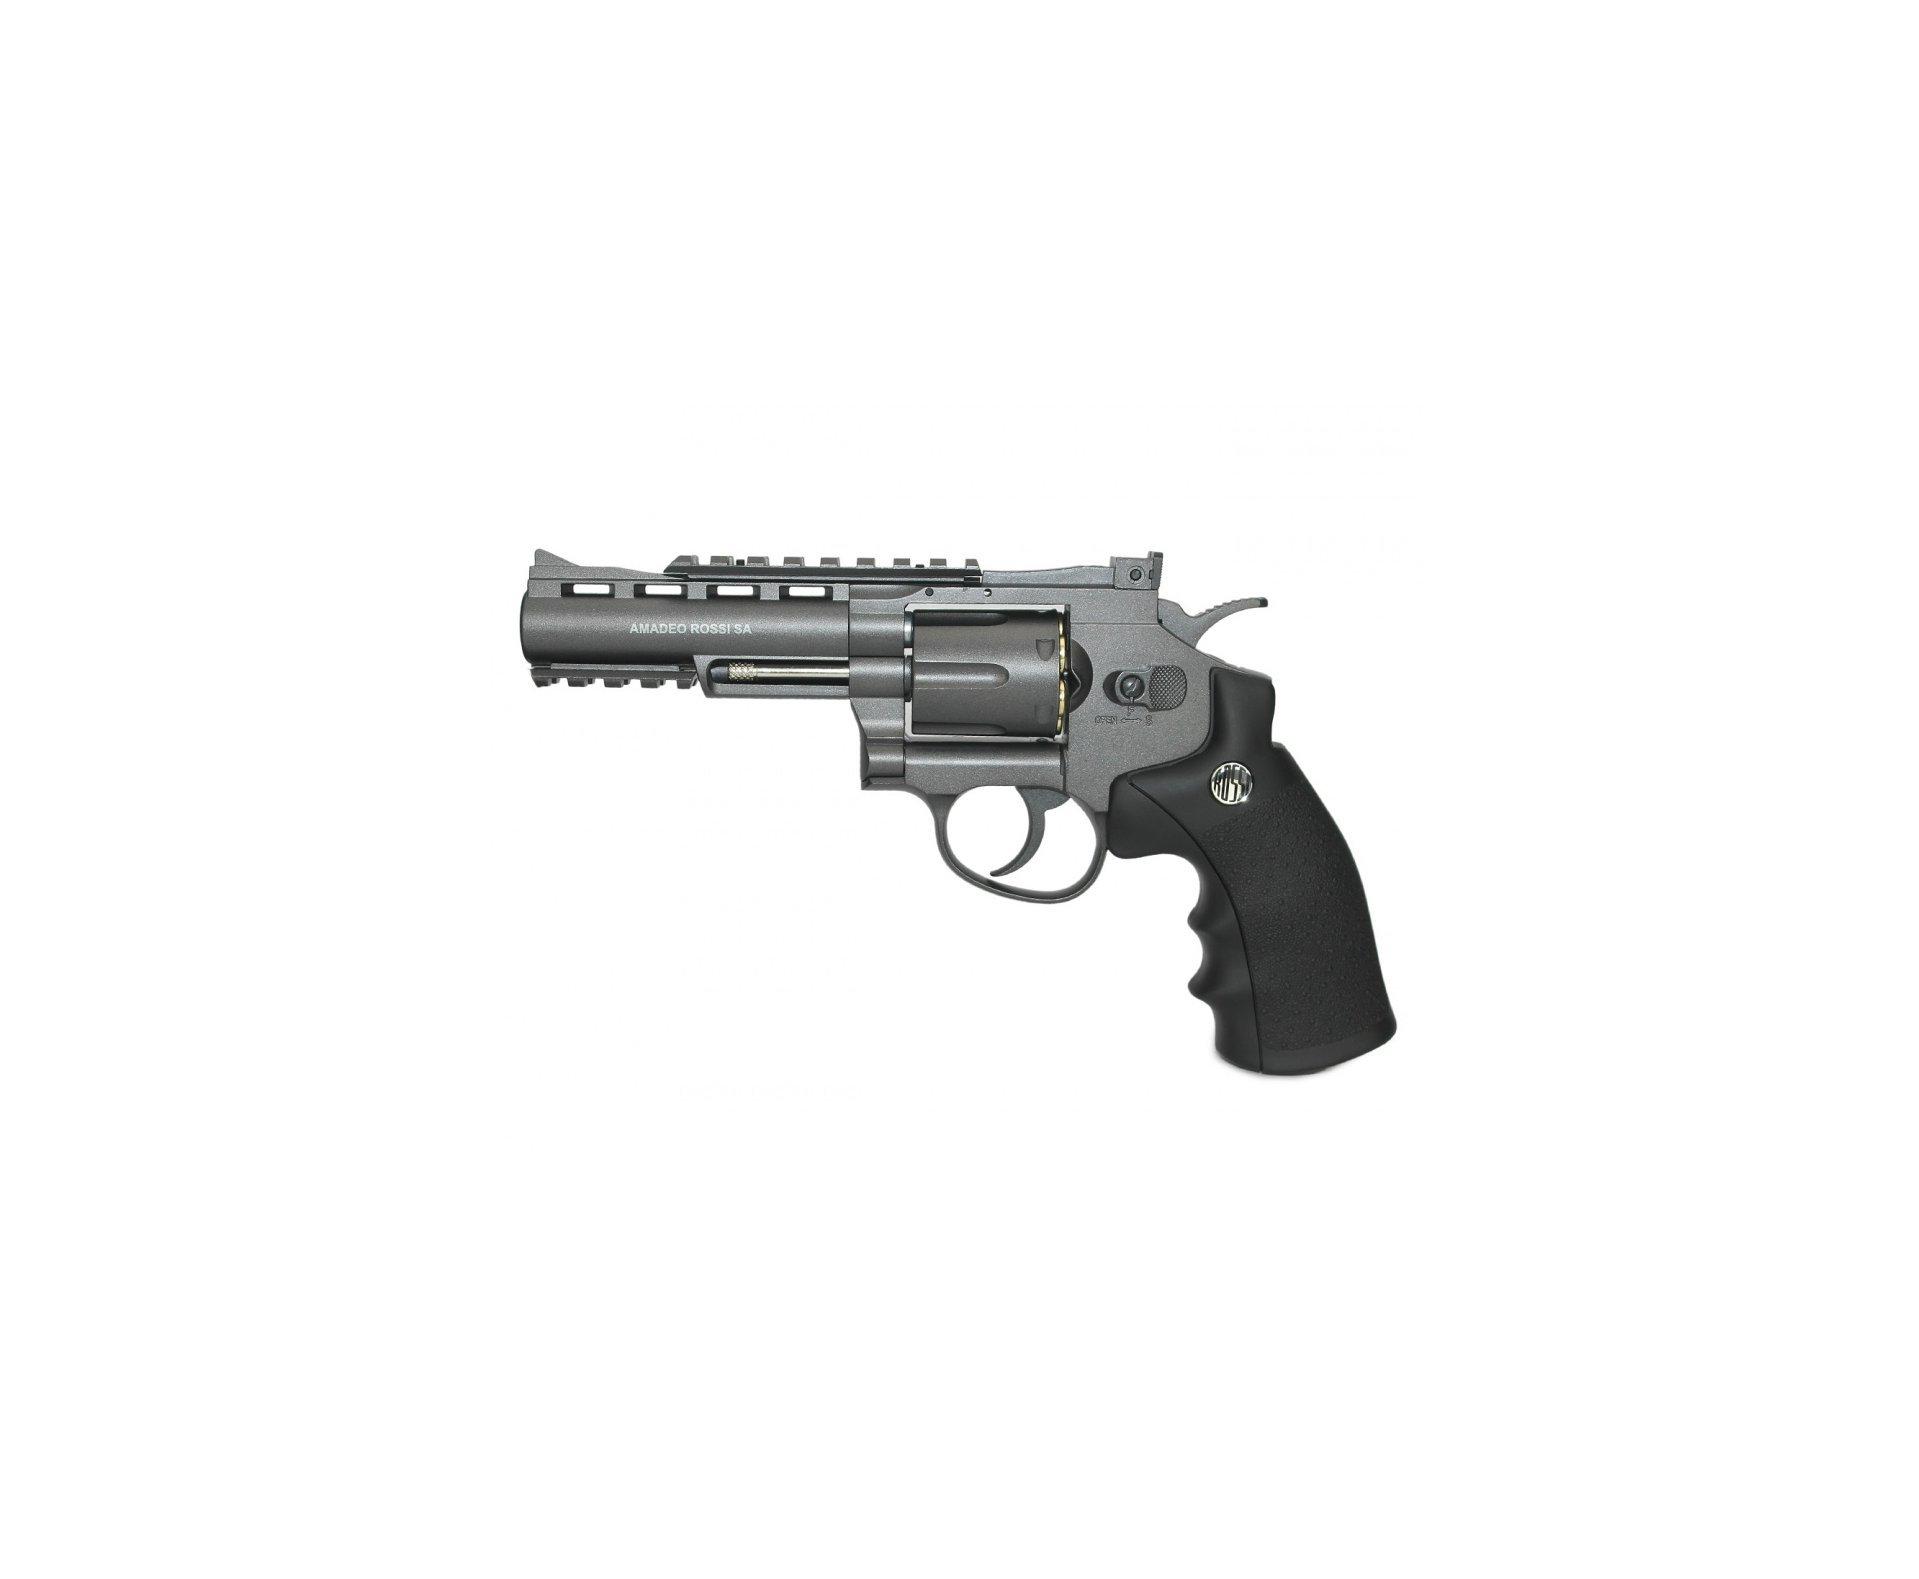 "Revolver 38 De Pressão Gas Co2 6 Tiros 4"" Oxidado Rossi Full Metal M701 4,5mm - Wingun + 3x Cilindro Co2 + Esfera De Aço 300uni"